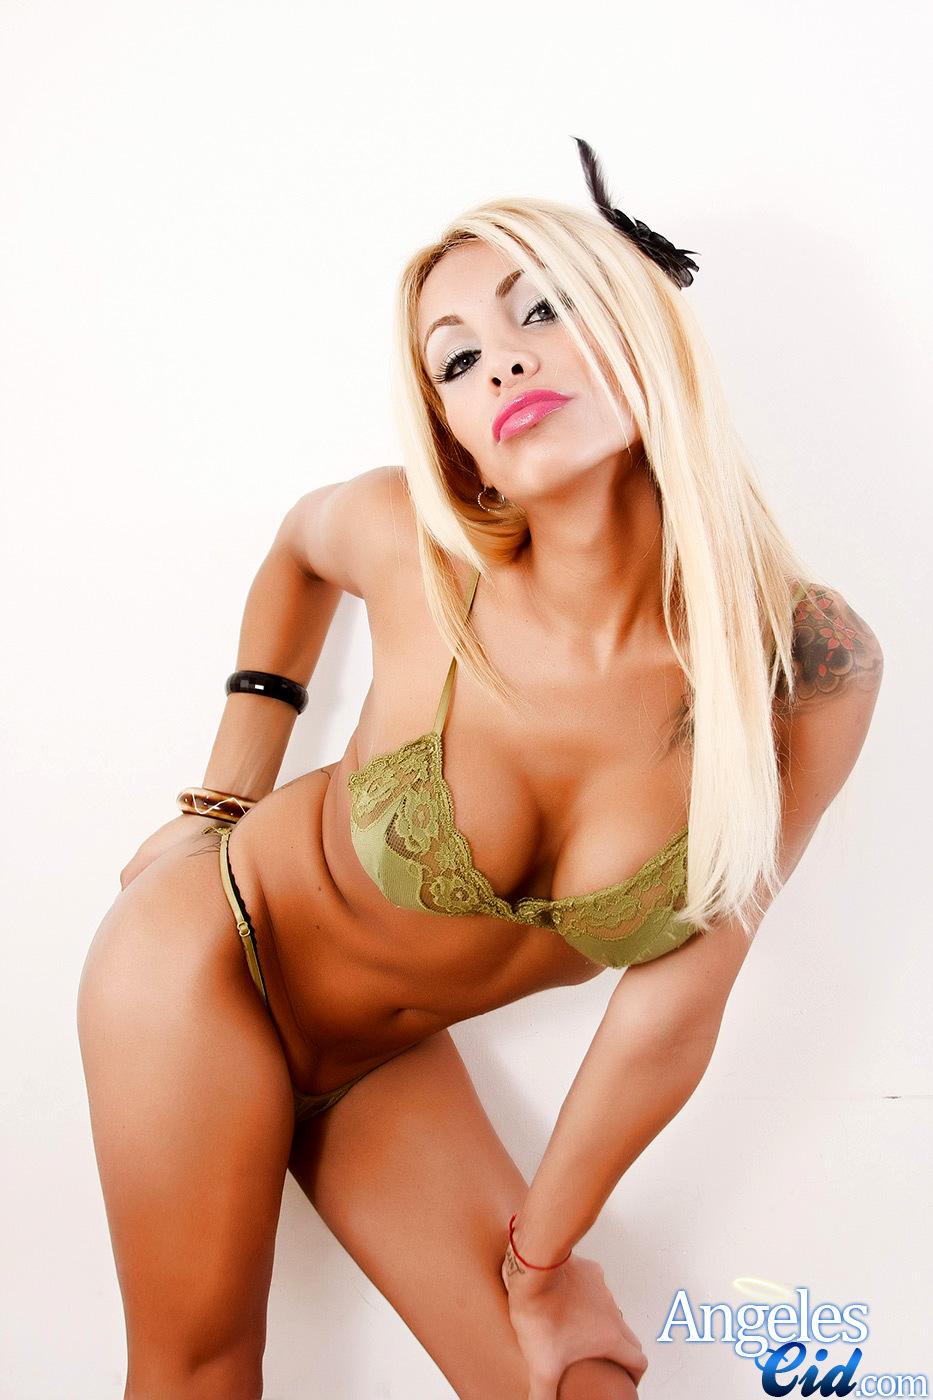 Gorgeous Blonde T-Girl Taking Off Her Green Lingerie